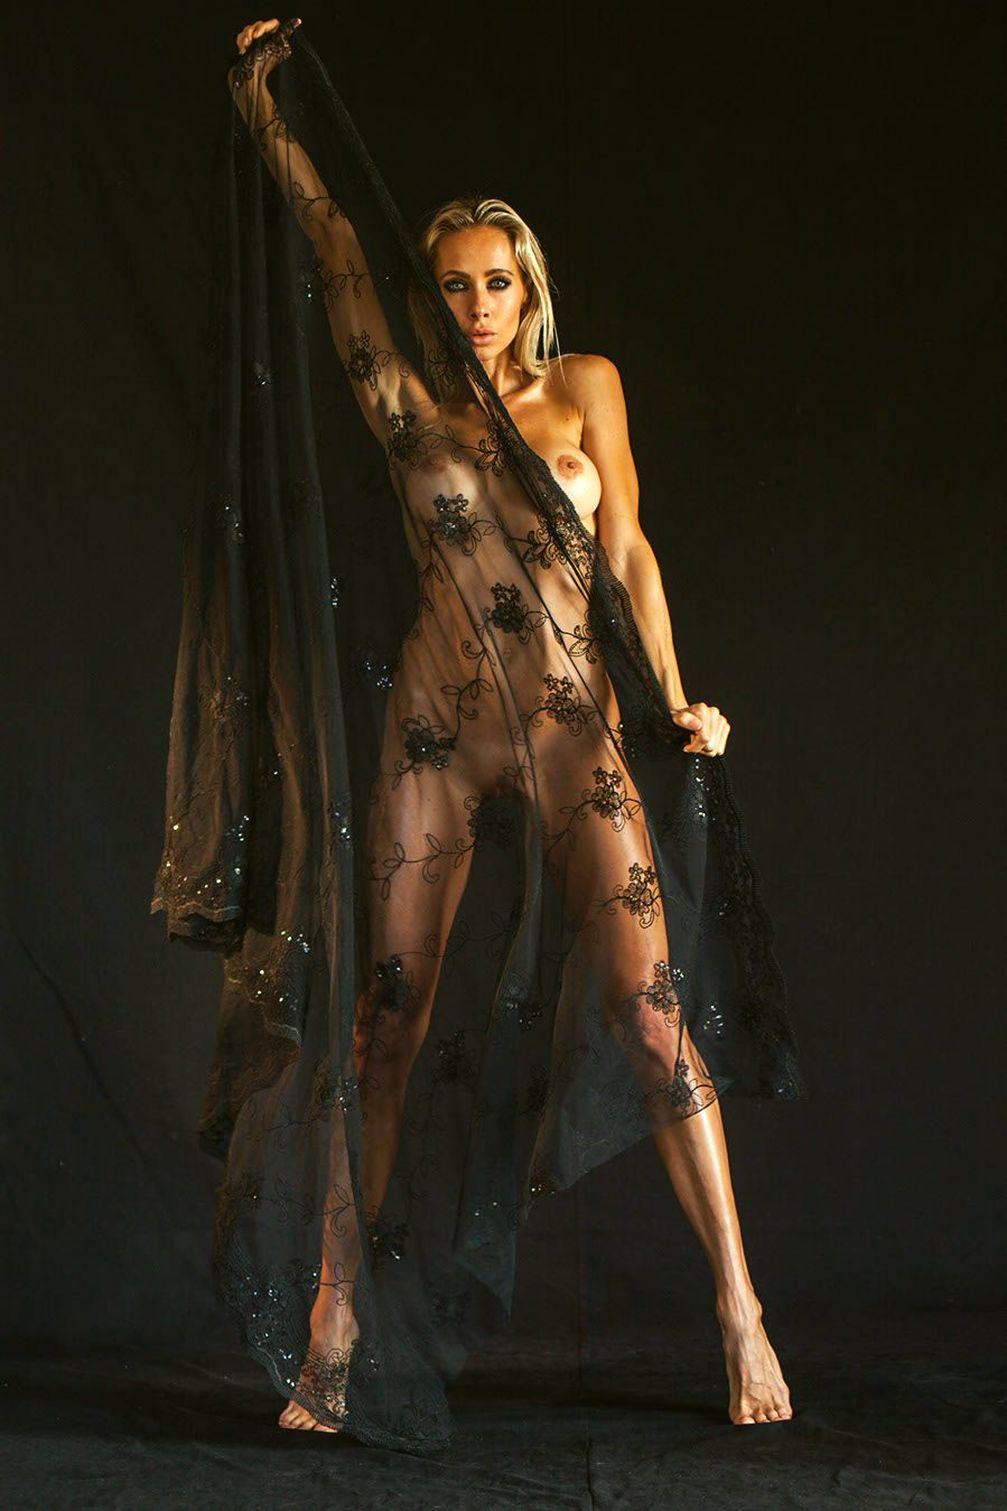 Yoga Teacher Jesse Golden Nude Private Photo Shoot Leaked